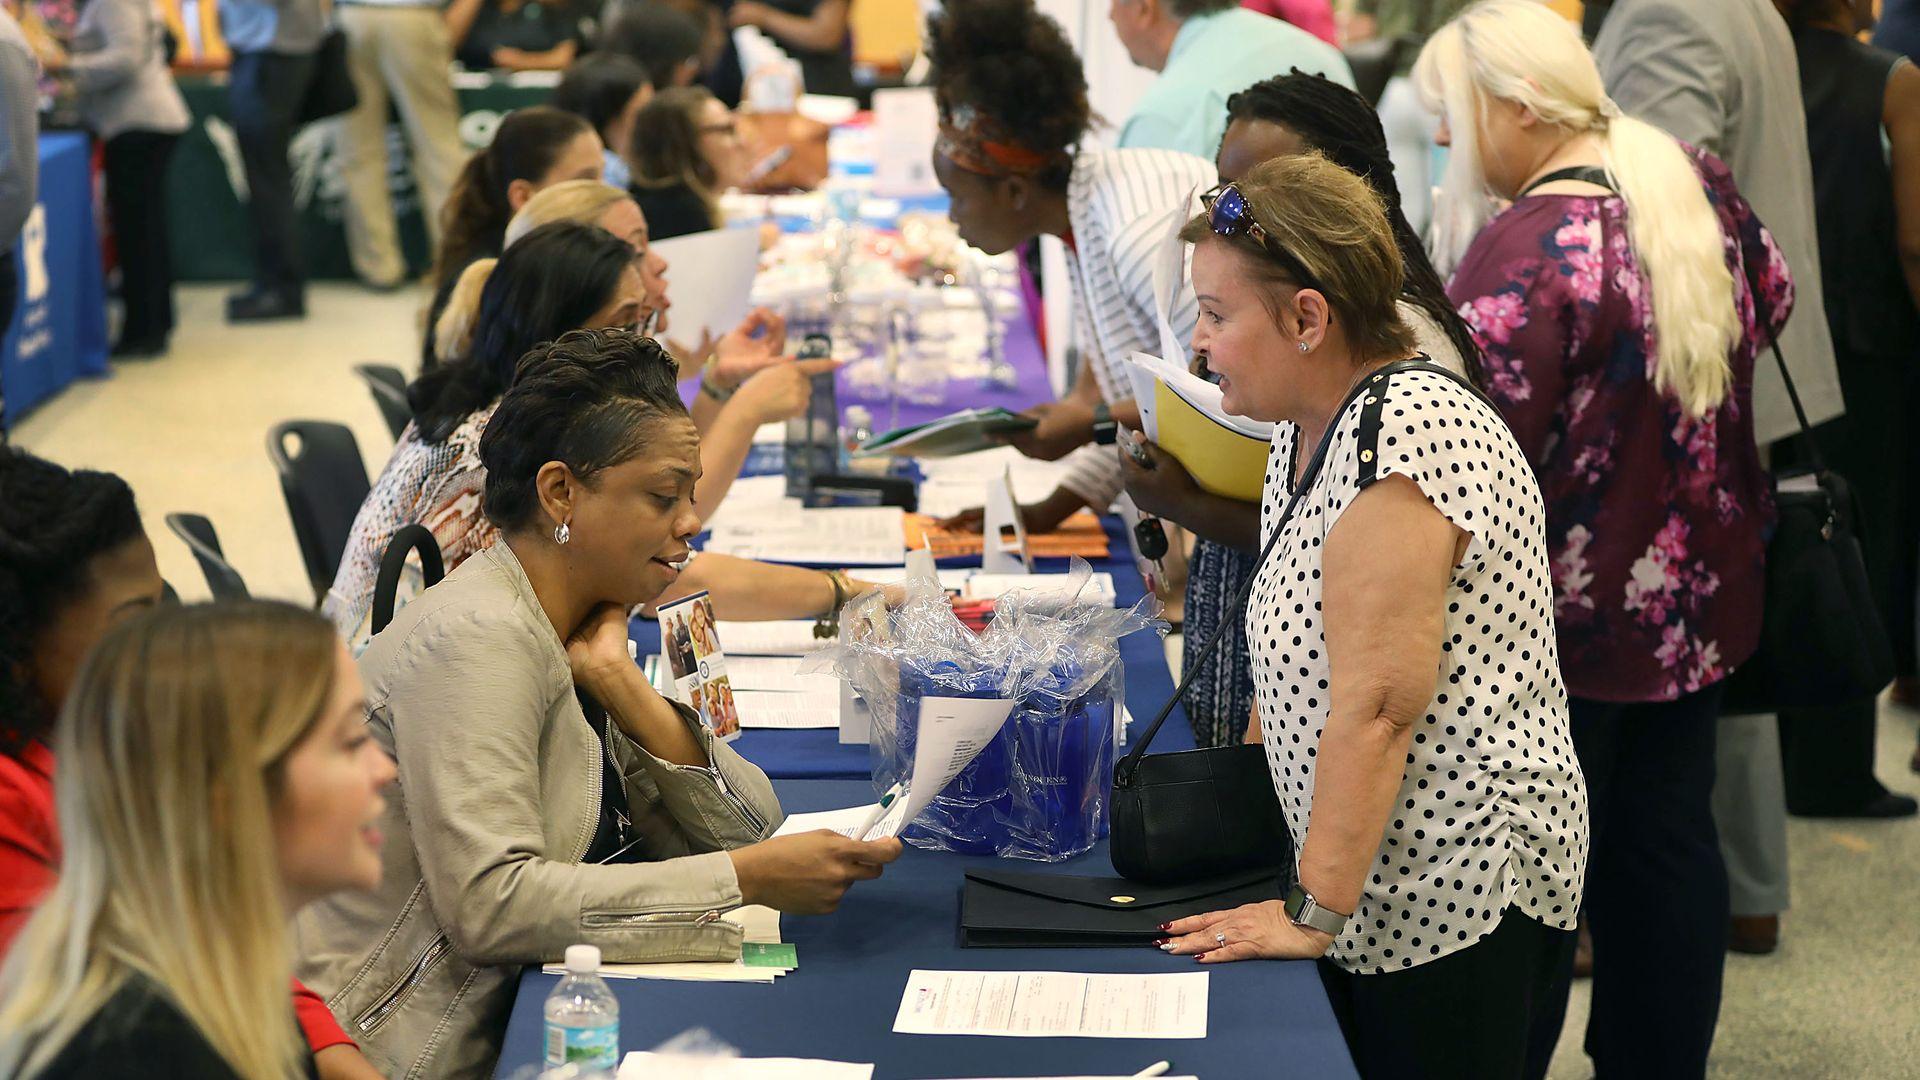 People attend a job fair in Miami, Fla., in April 2019.